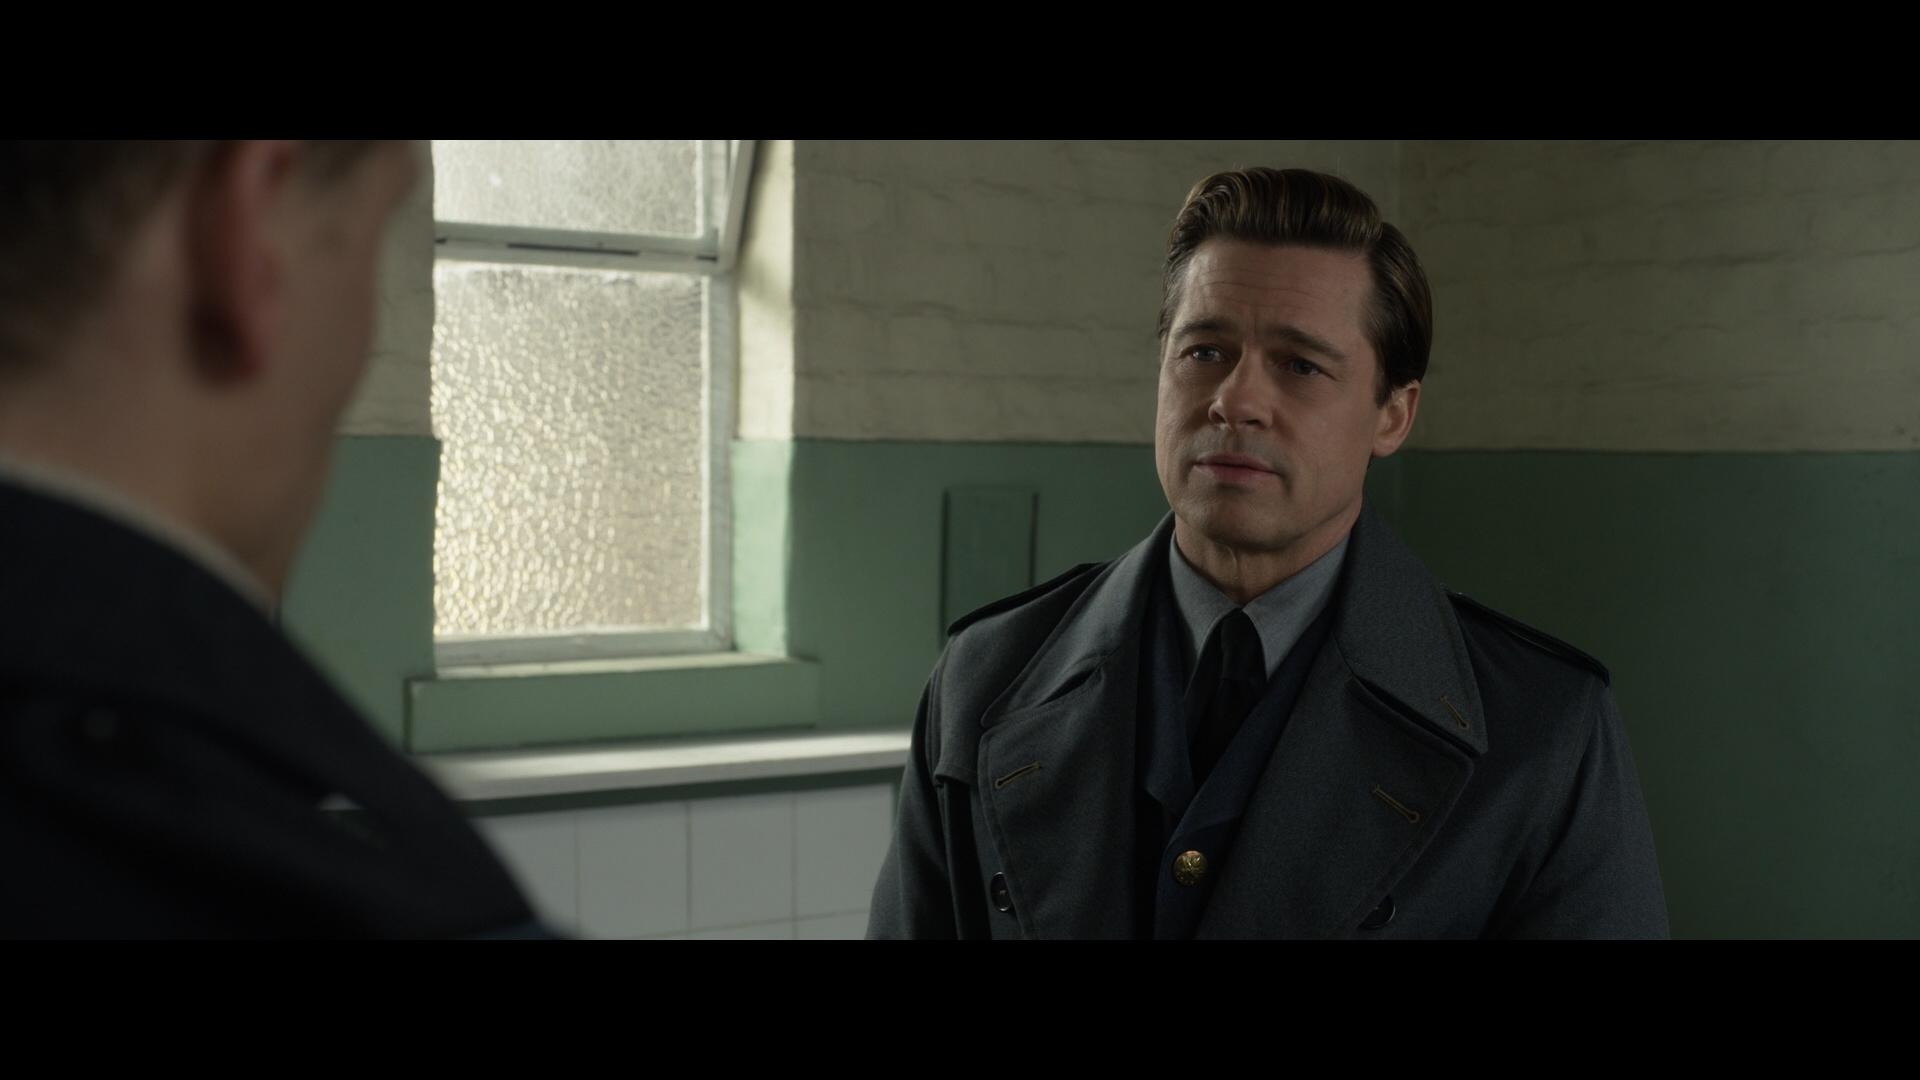 ALLIED (2016) - Max's (Brad Pitt) Military Overcoat - Image 17 of 17